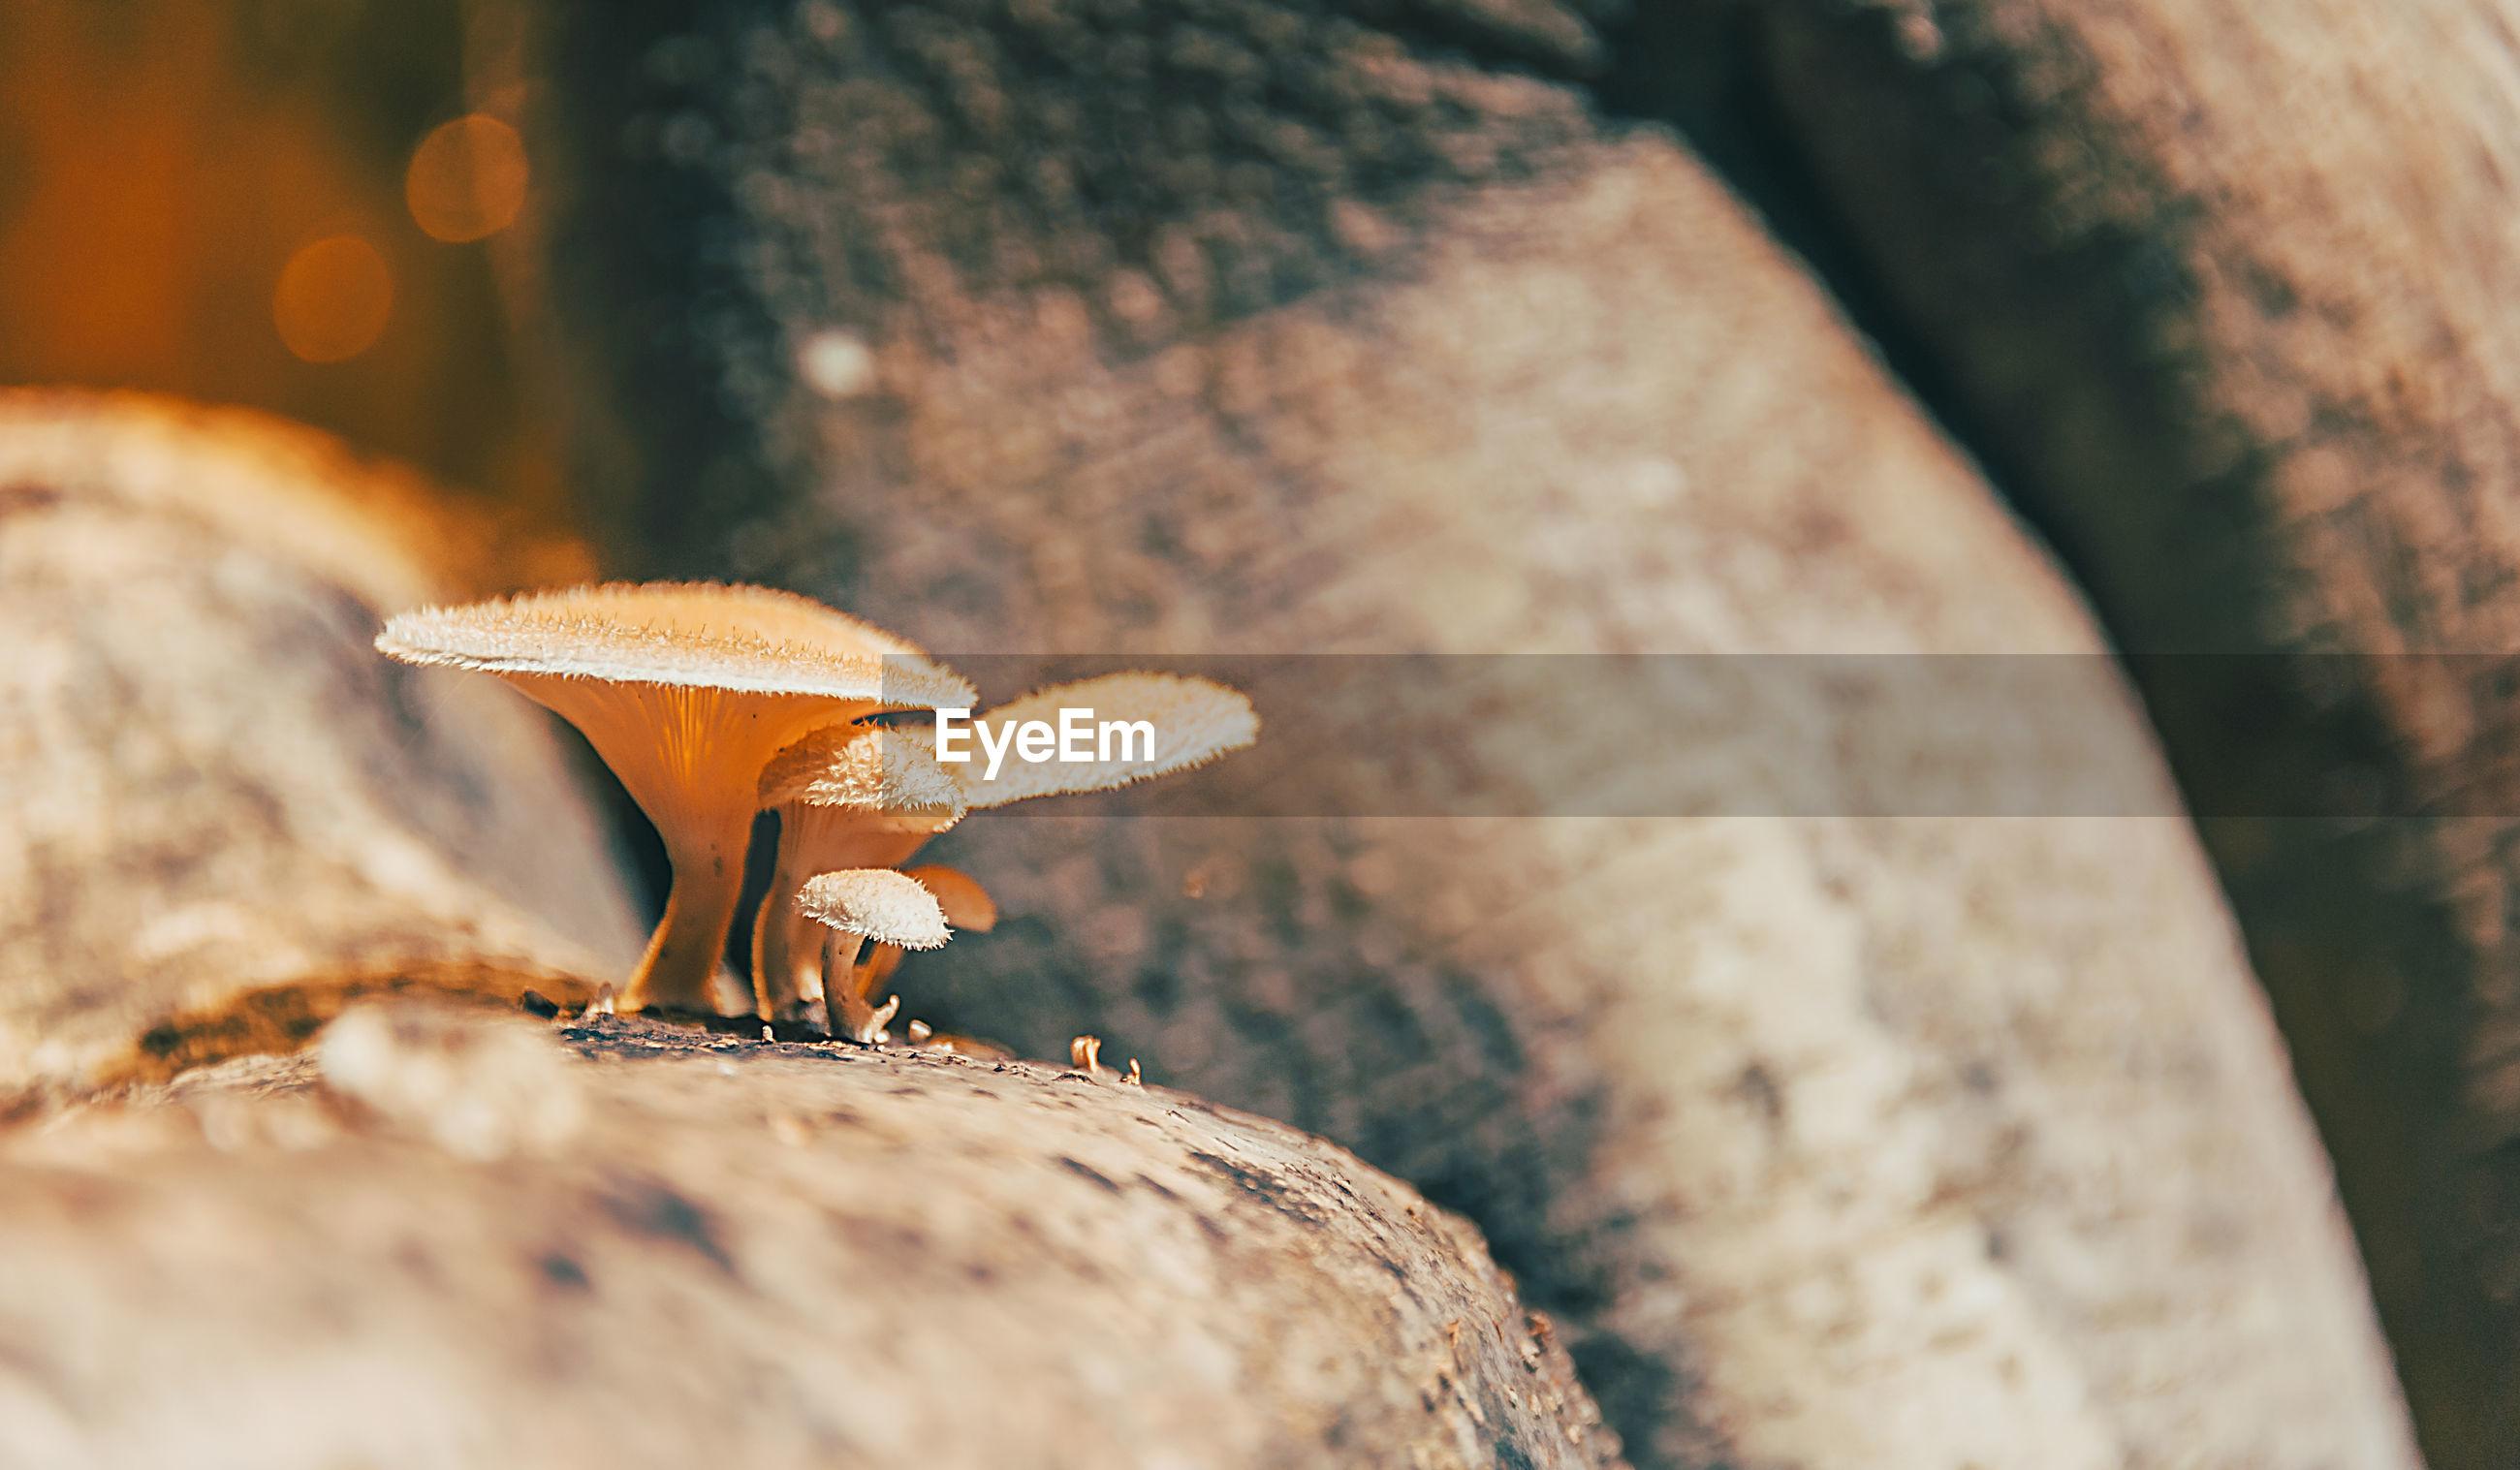 Close-up of mushroom growing on wood